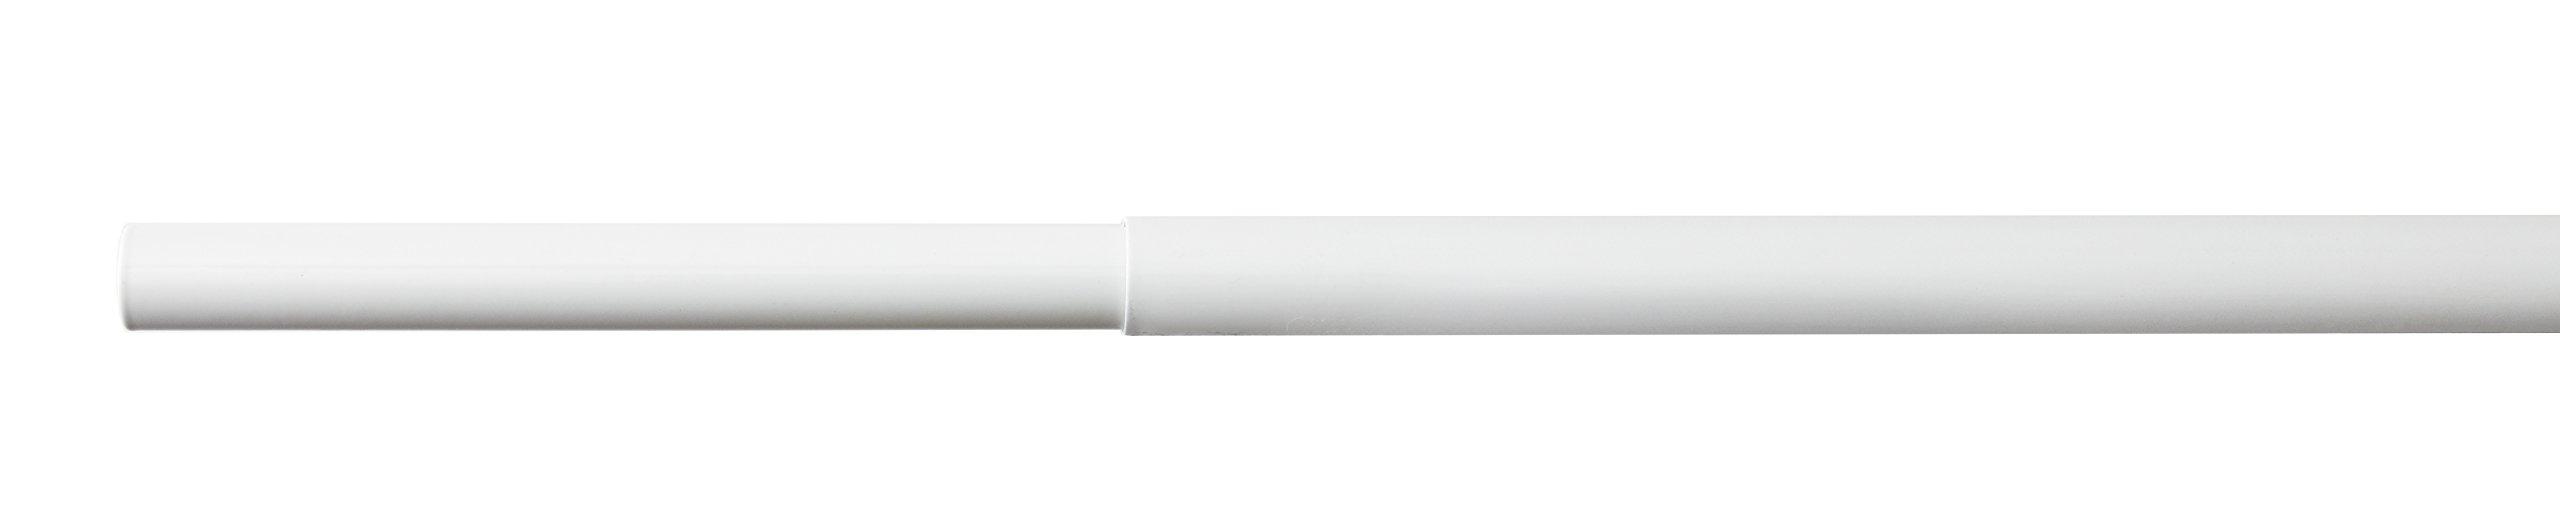 ClosetMaid 2051 SuperSlide Adjustable Hanging Closet Rod, 4' to 6', White by ClosetMaid